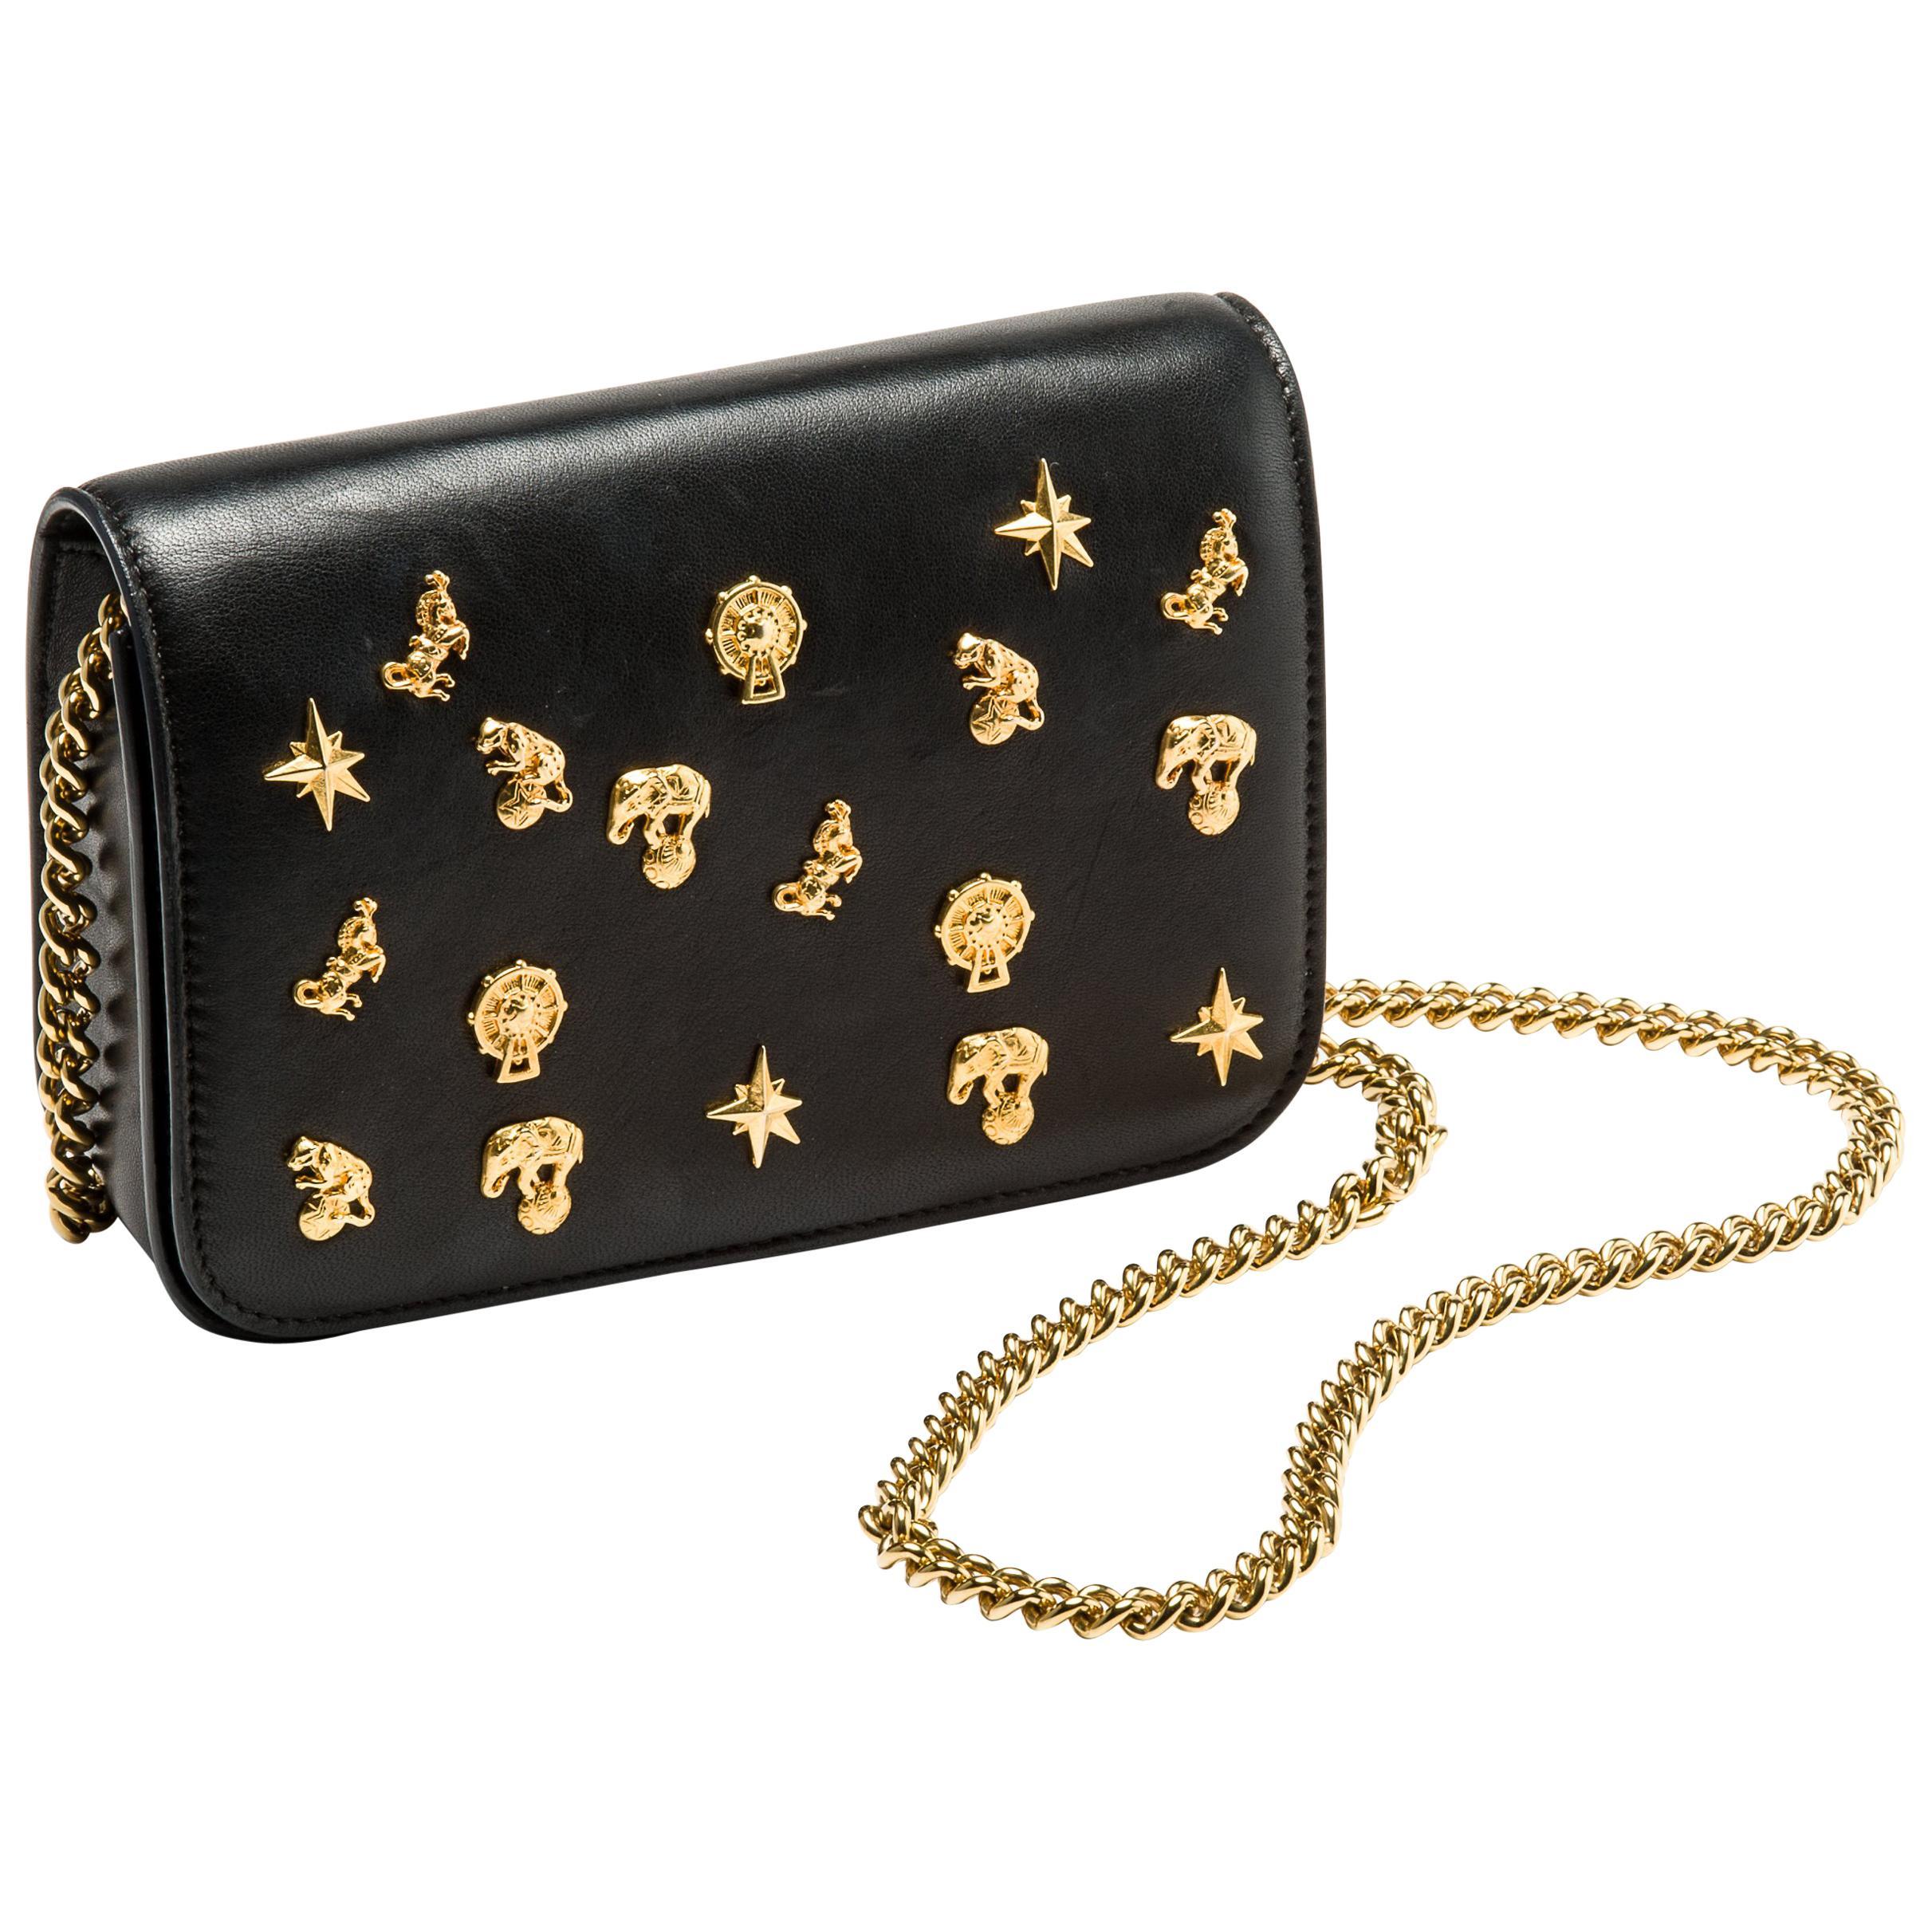 Roberto Cavalli Circus Purse Black Leather Gold Animal Embellishment Chain Strap